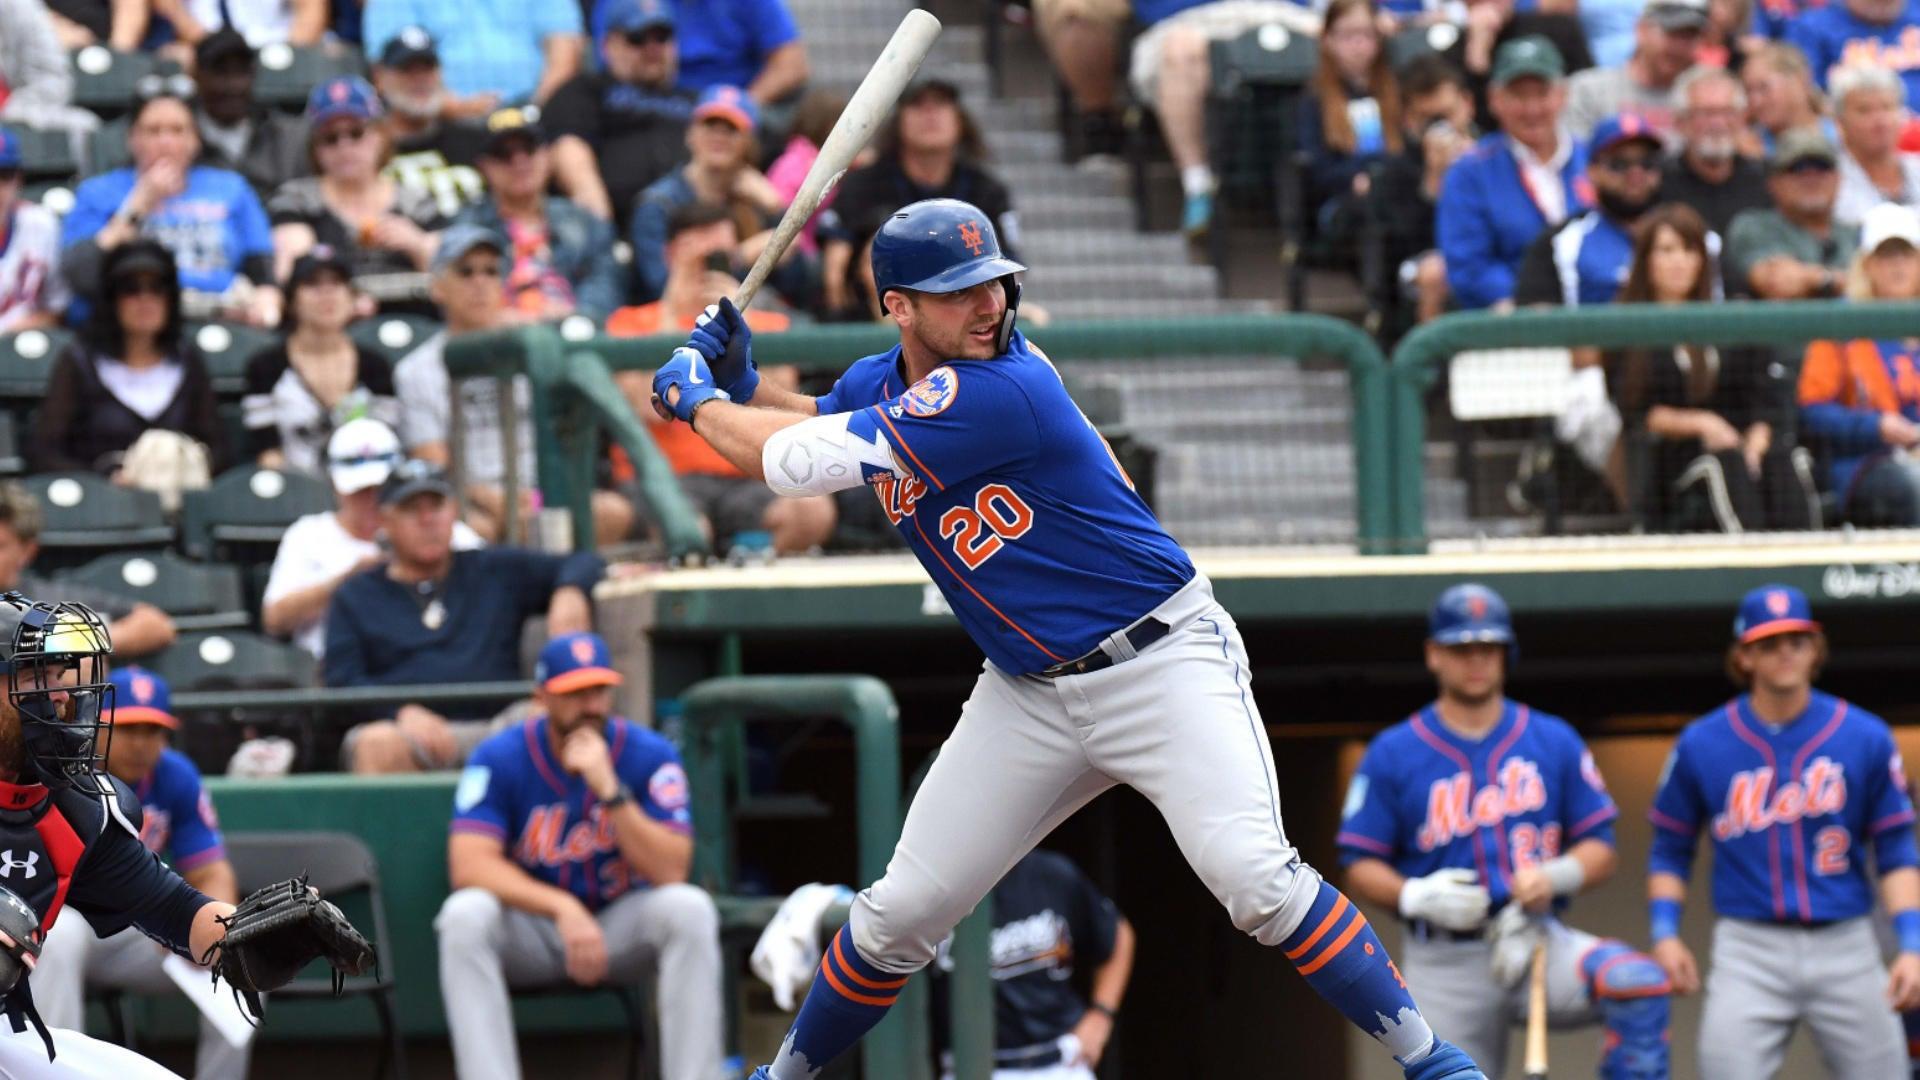 2019 Fantasy Baseball Draft Prep: First Base Tiers 3.0